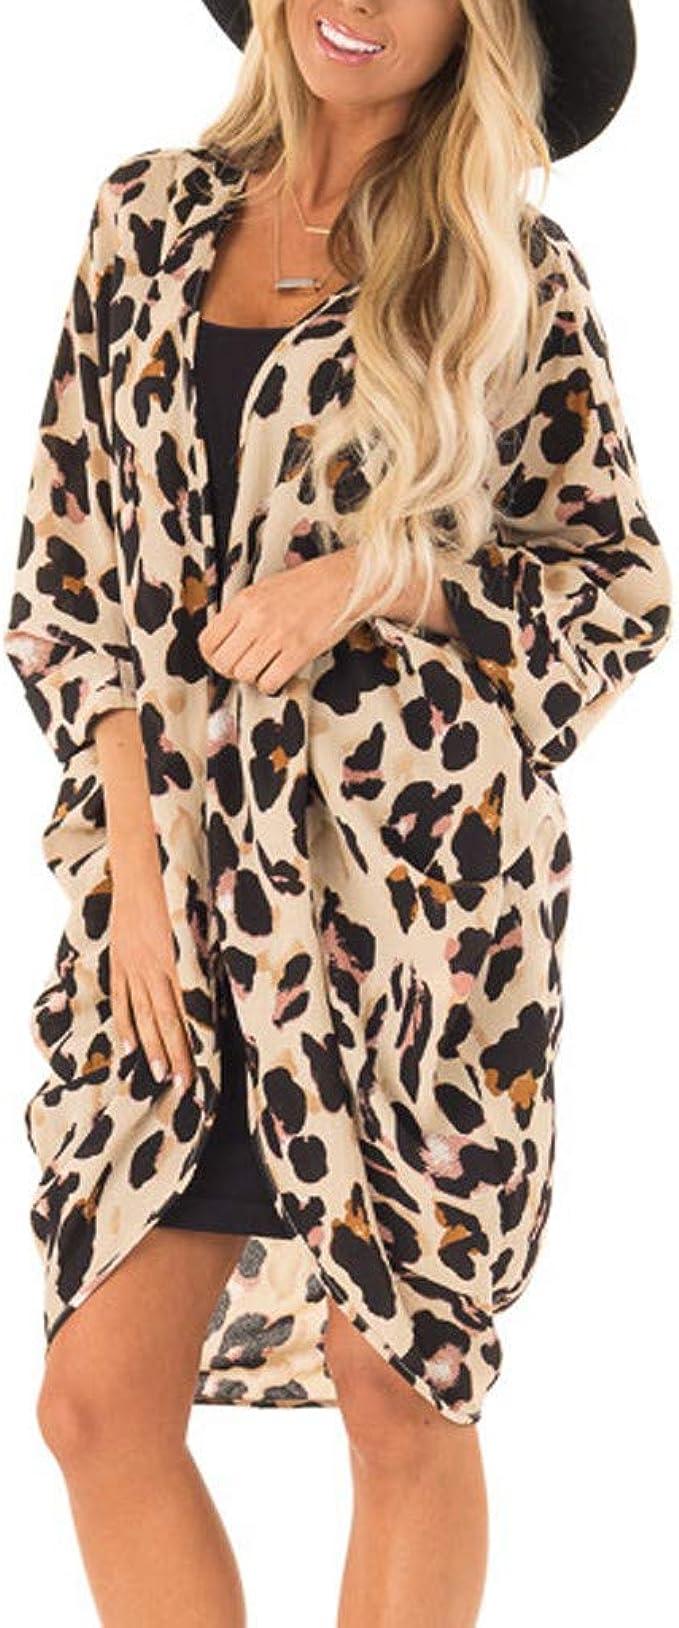 DEELIN Kimono Mujer Verano Moda Leopardo ImpresióN Abrigo Tops ...